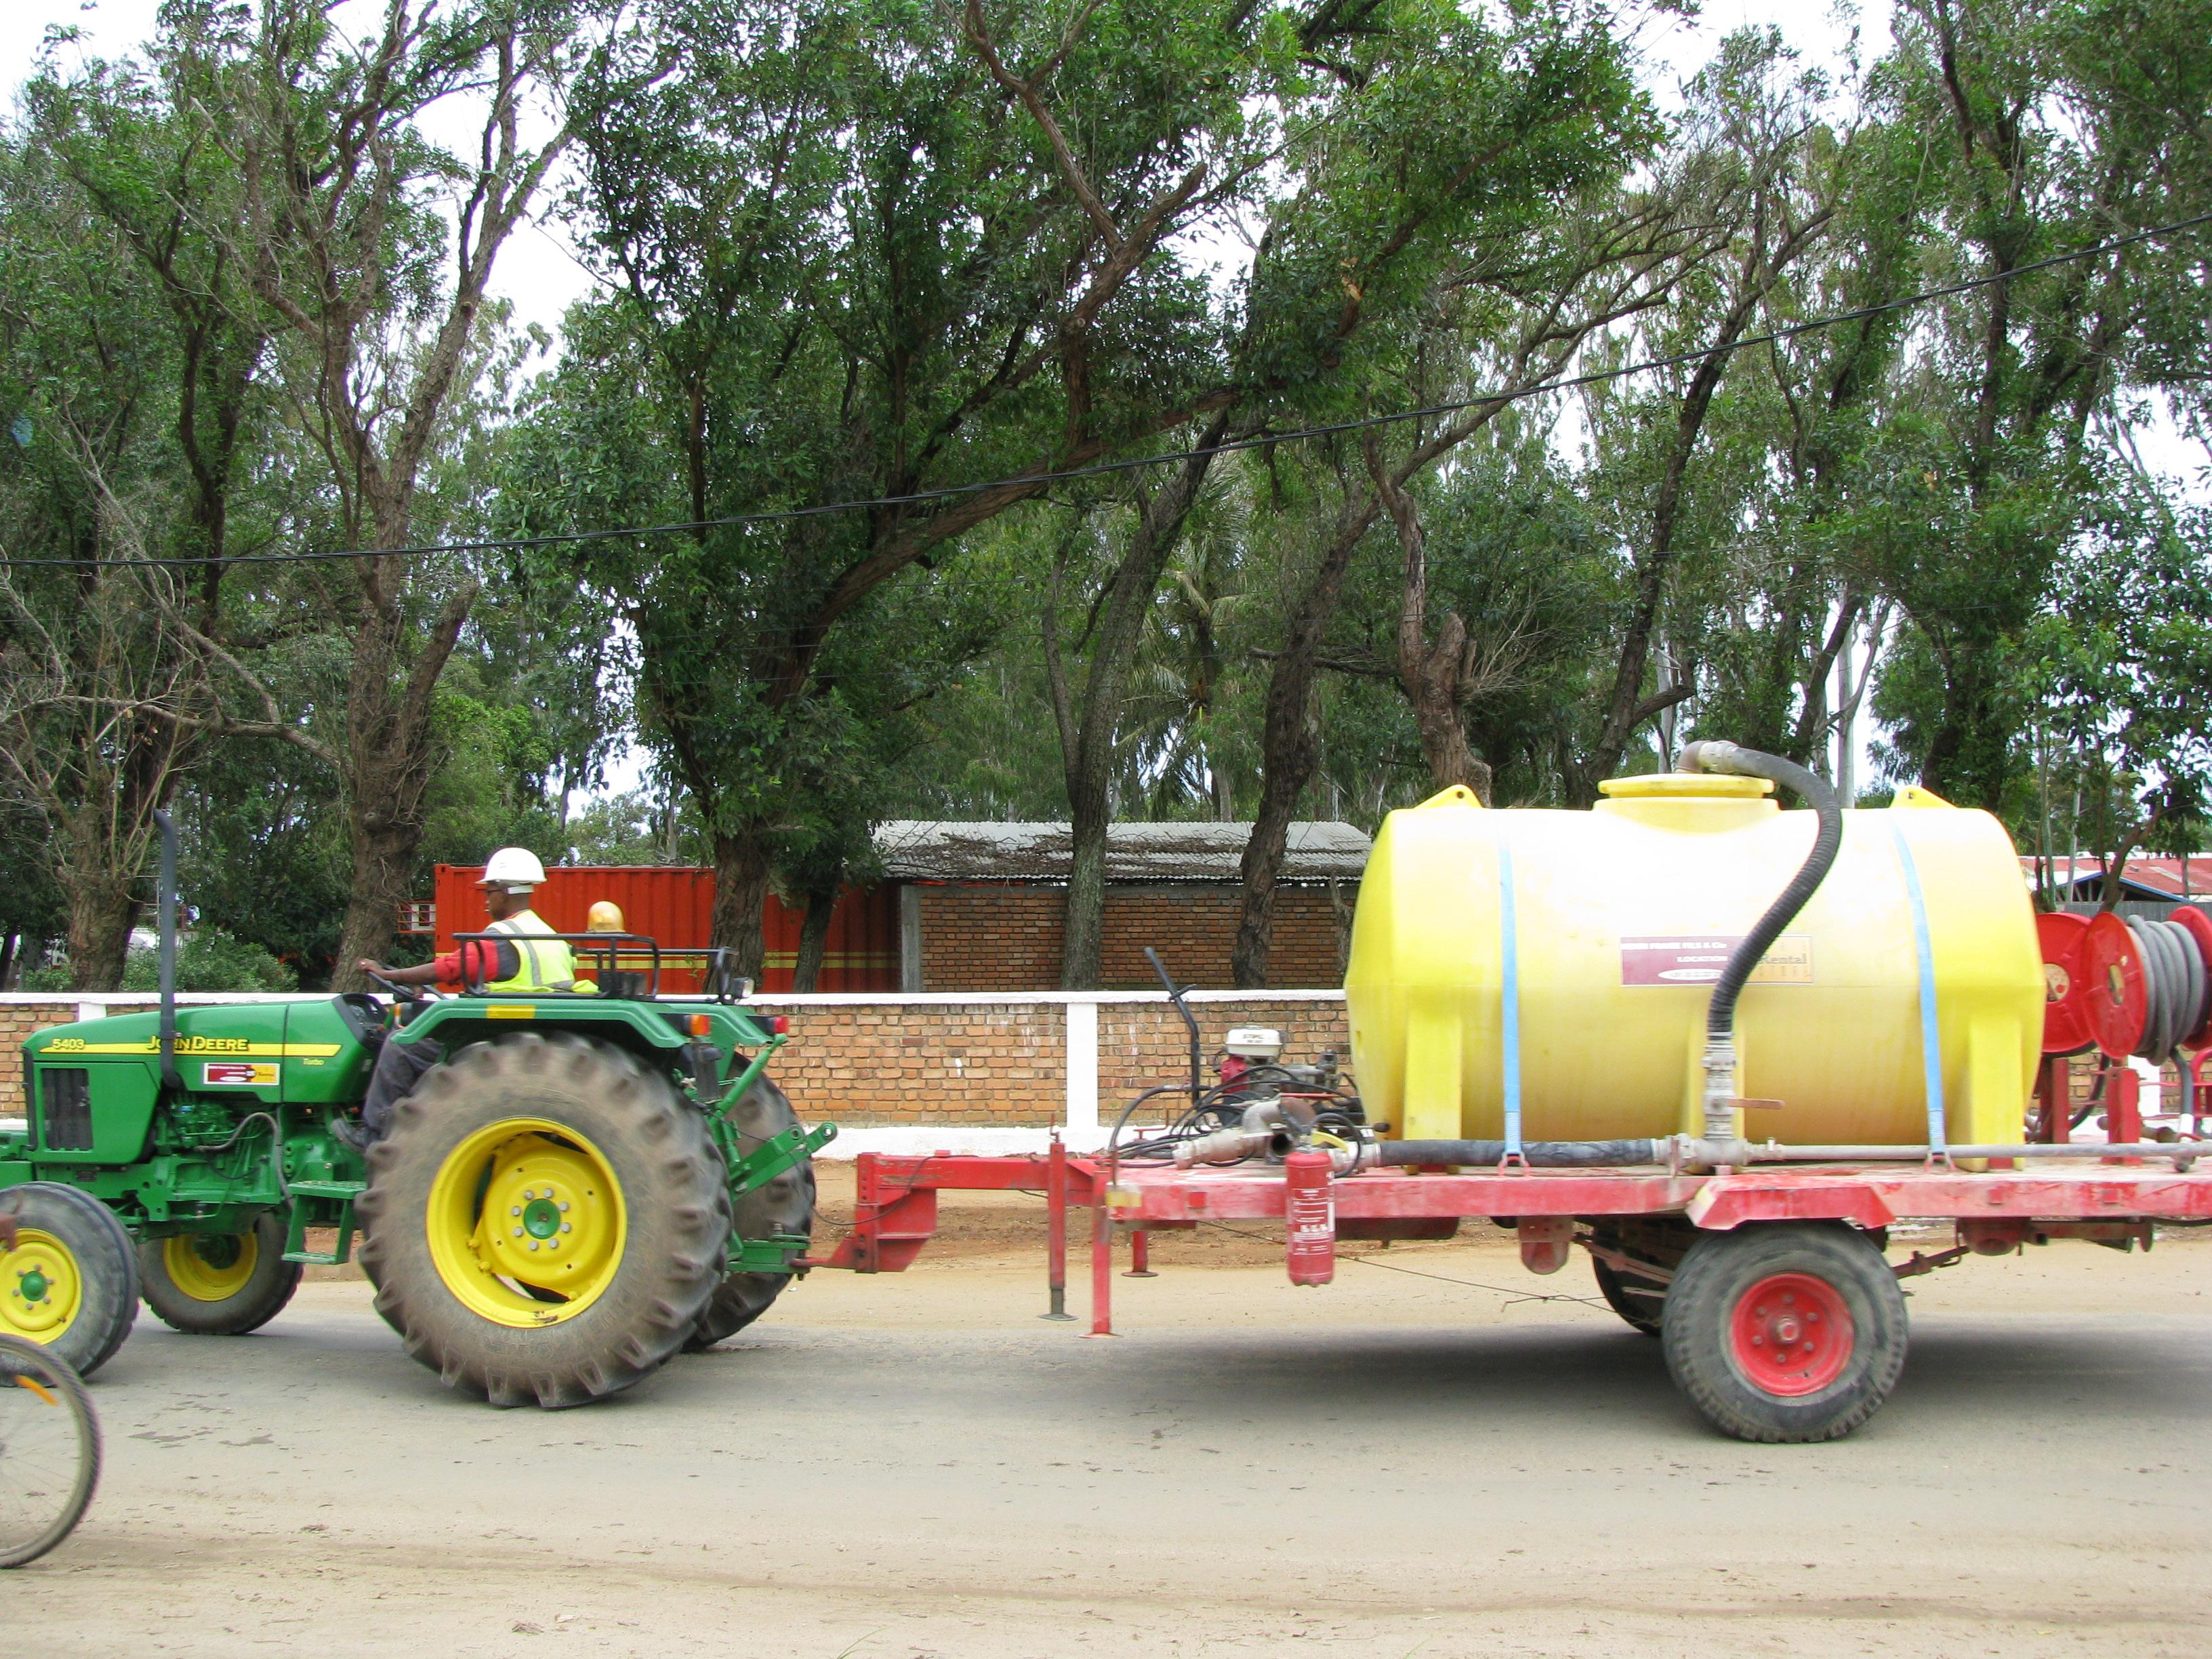 Those tractors get around